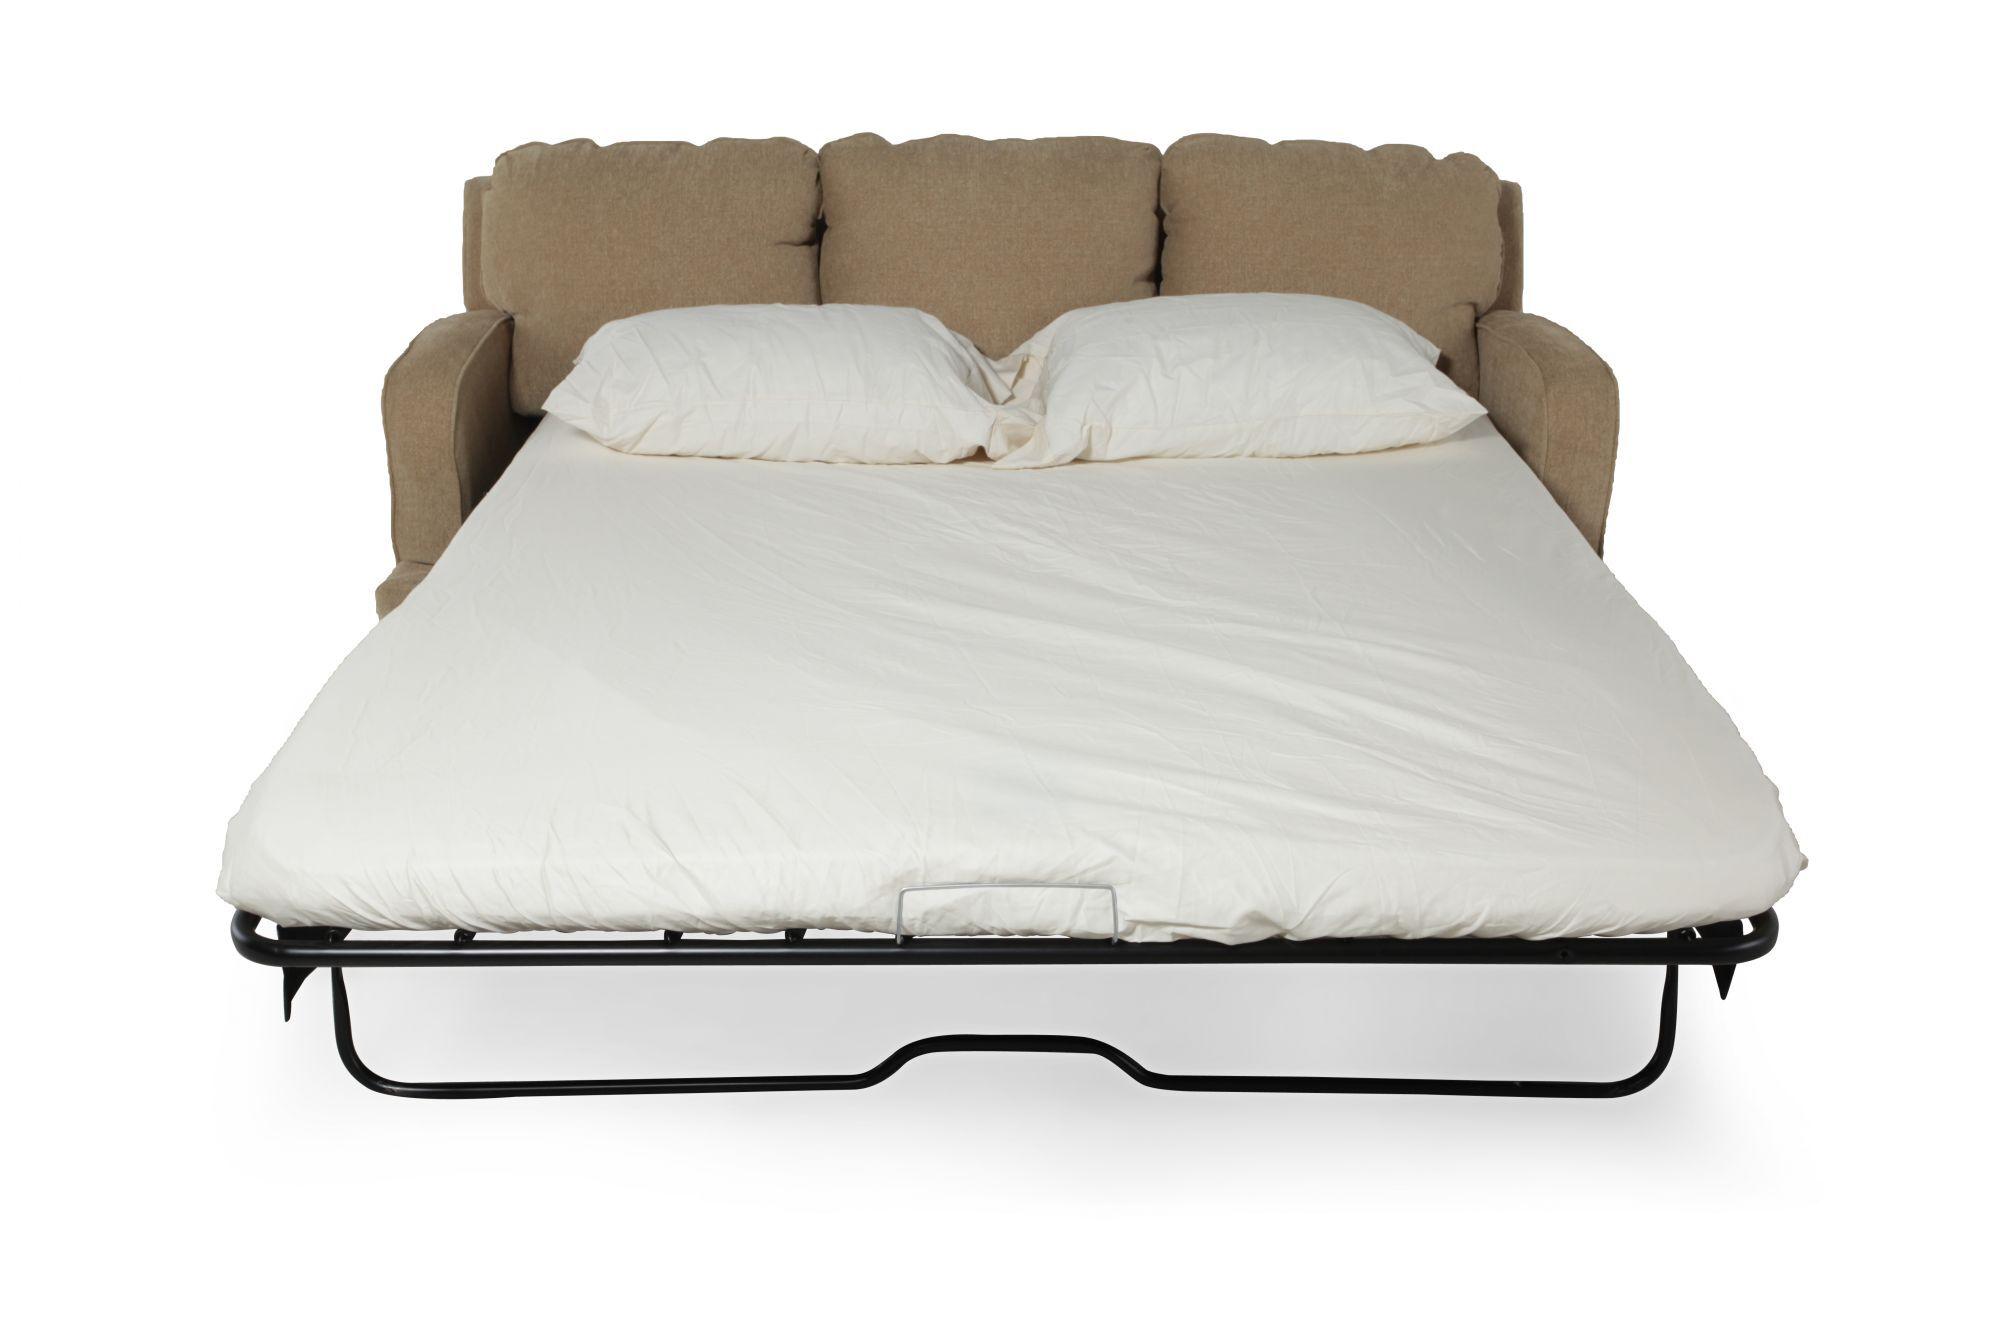 la z boy diana sleeper sofa cheap comfortable beds uk sesame queen mathis brothers